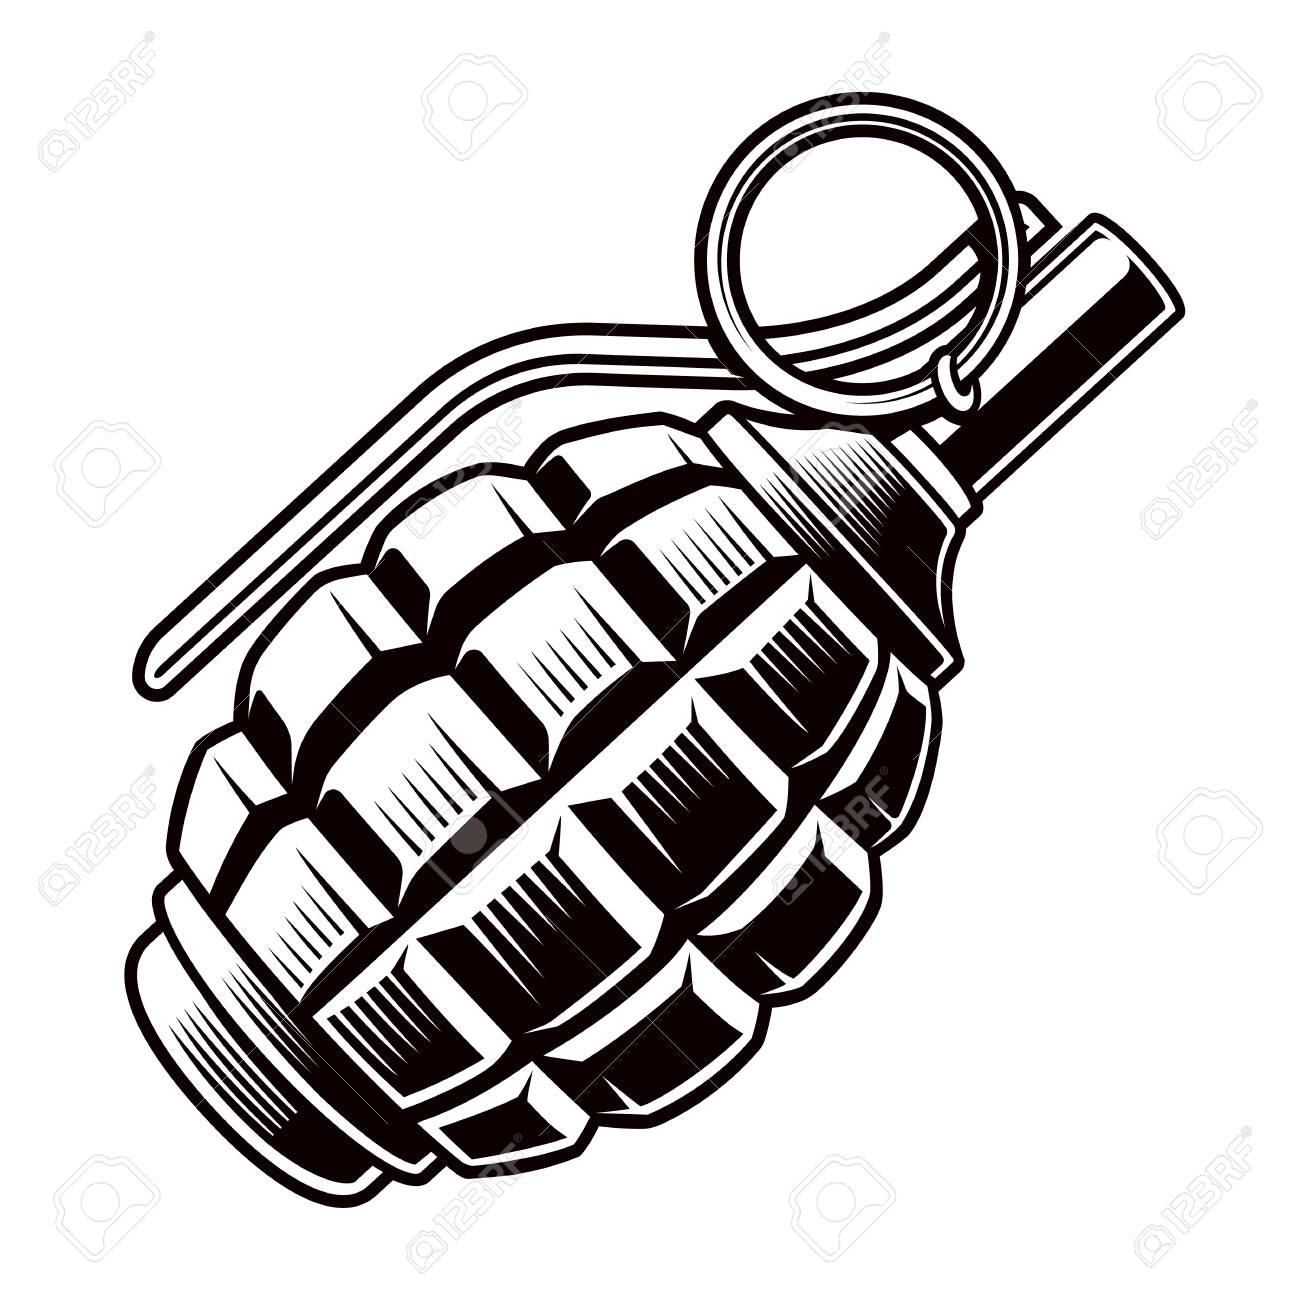 grenade vector black and white illustration royalty free cliparts rh 123rf com  hand grenade vector free